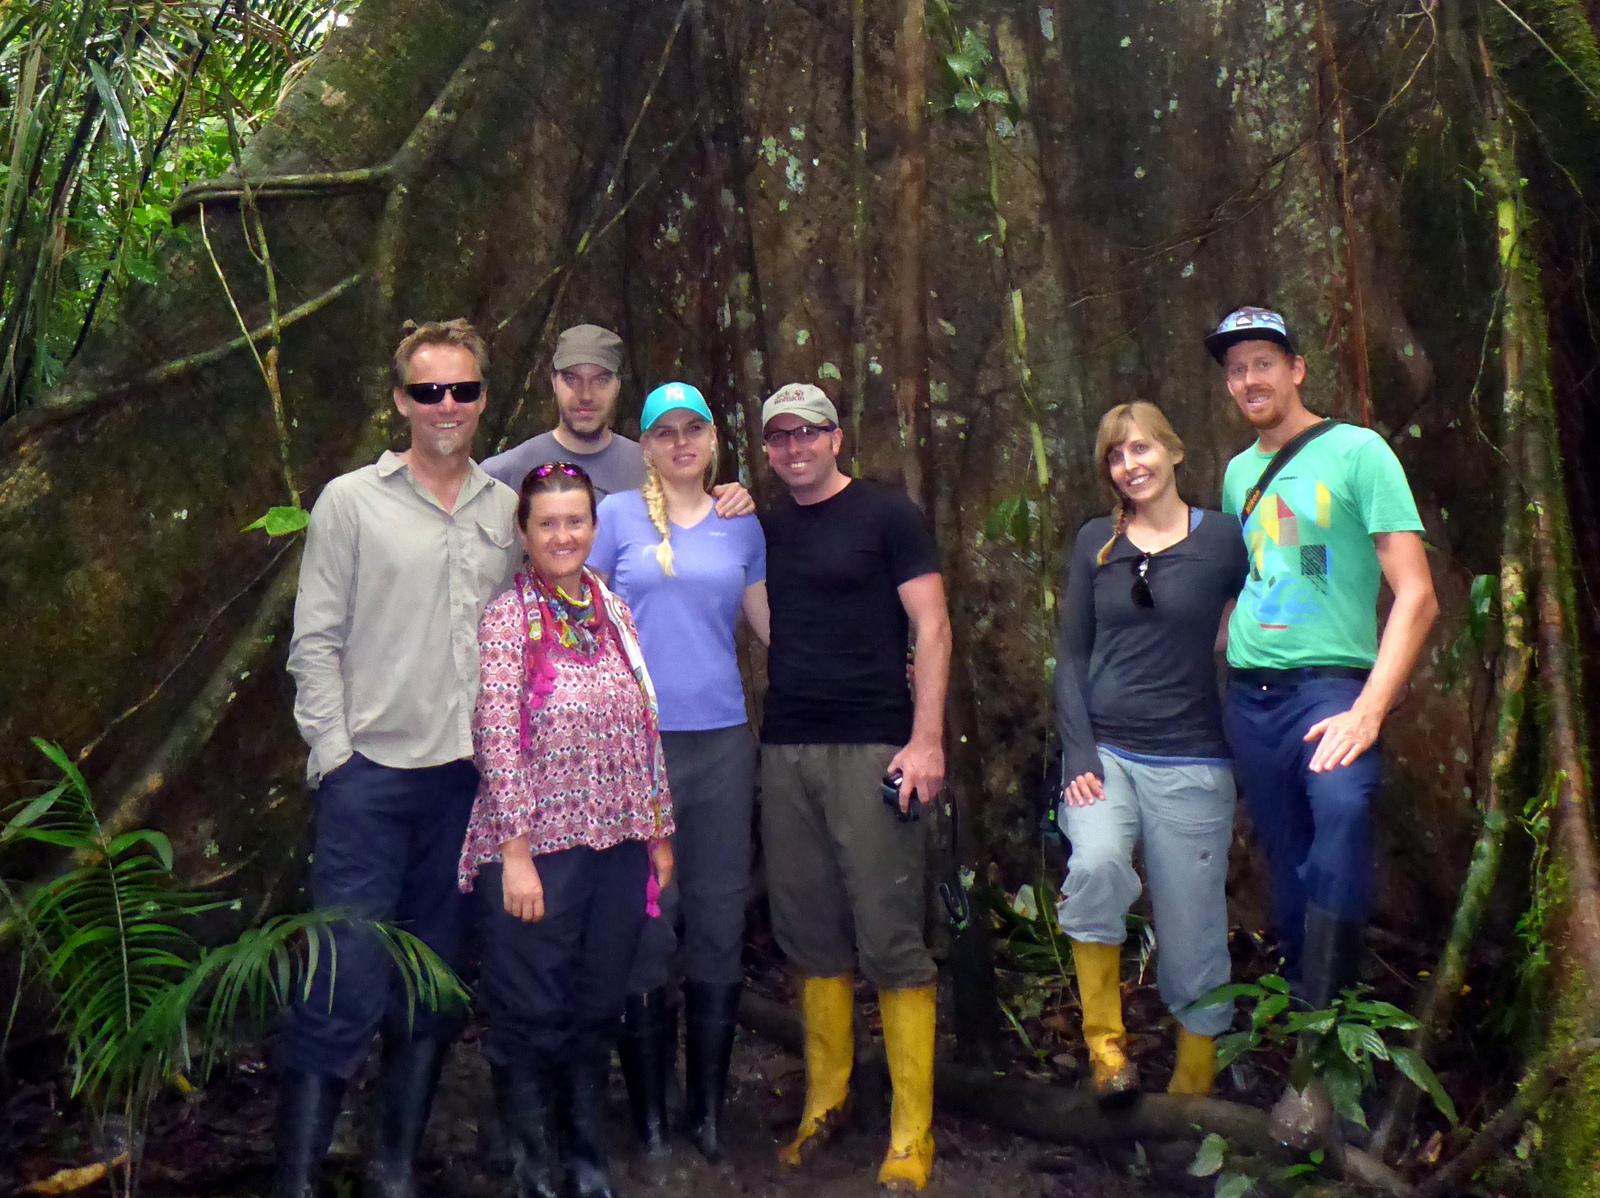 Unsere Dschungelgruppe